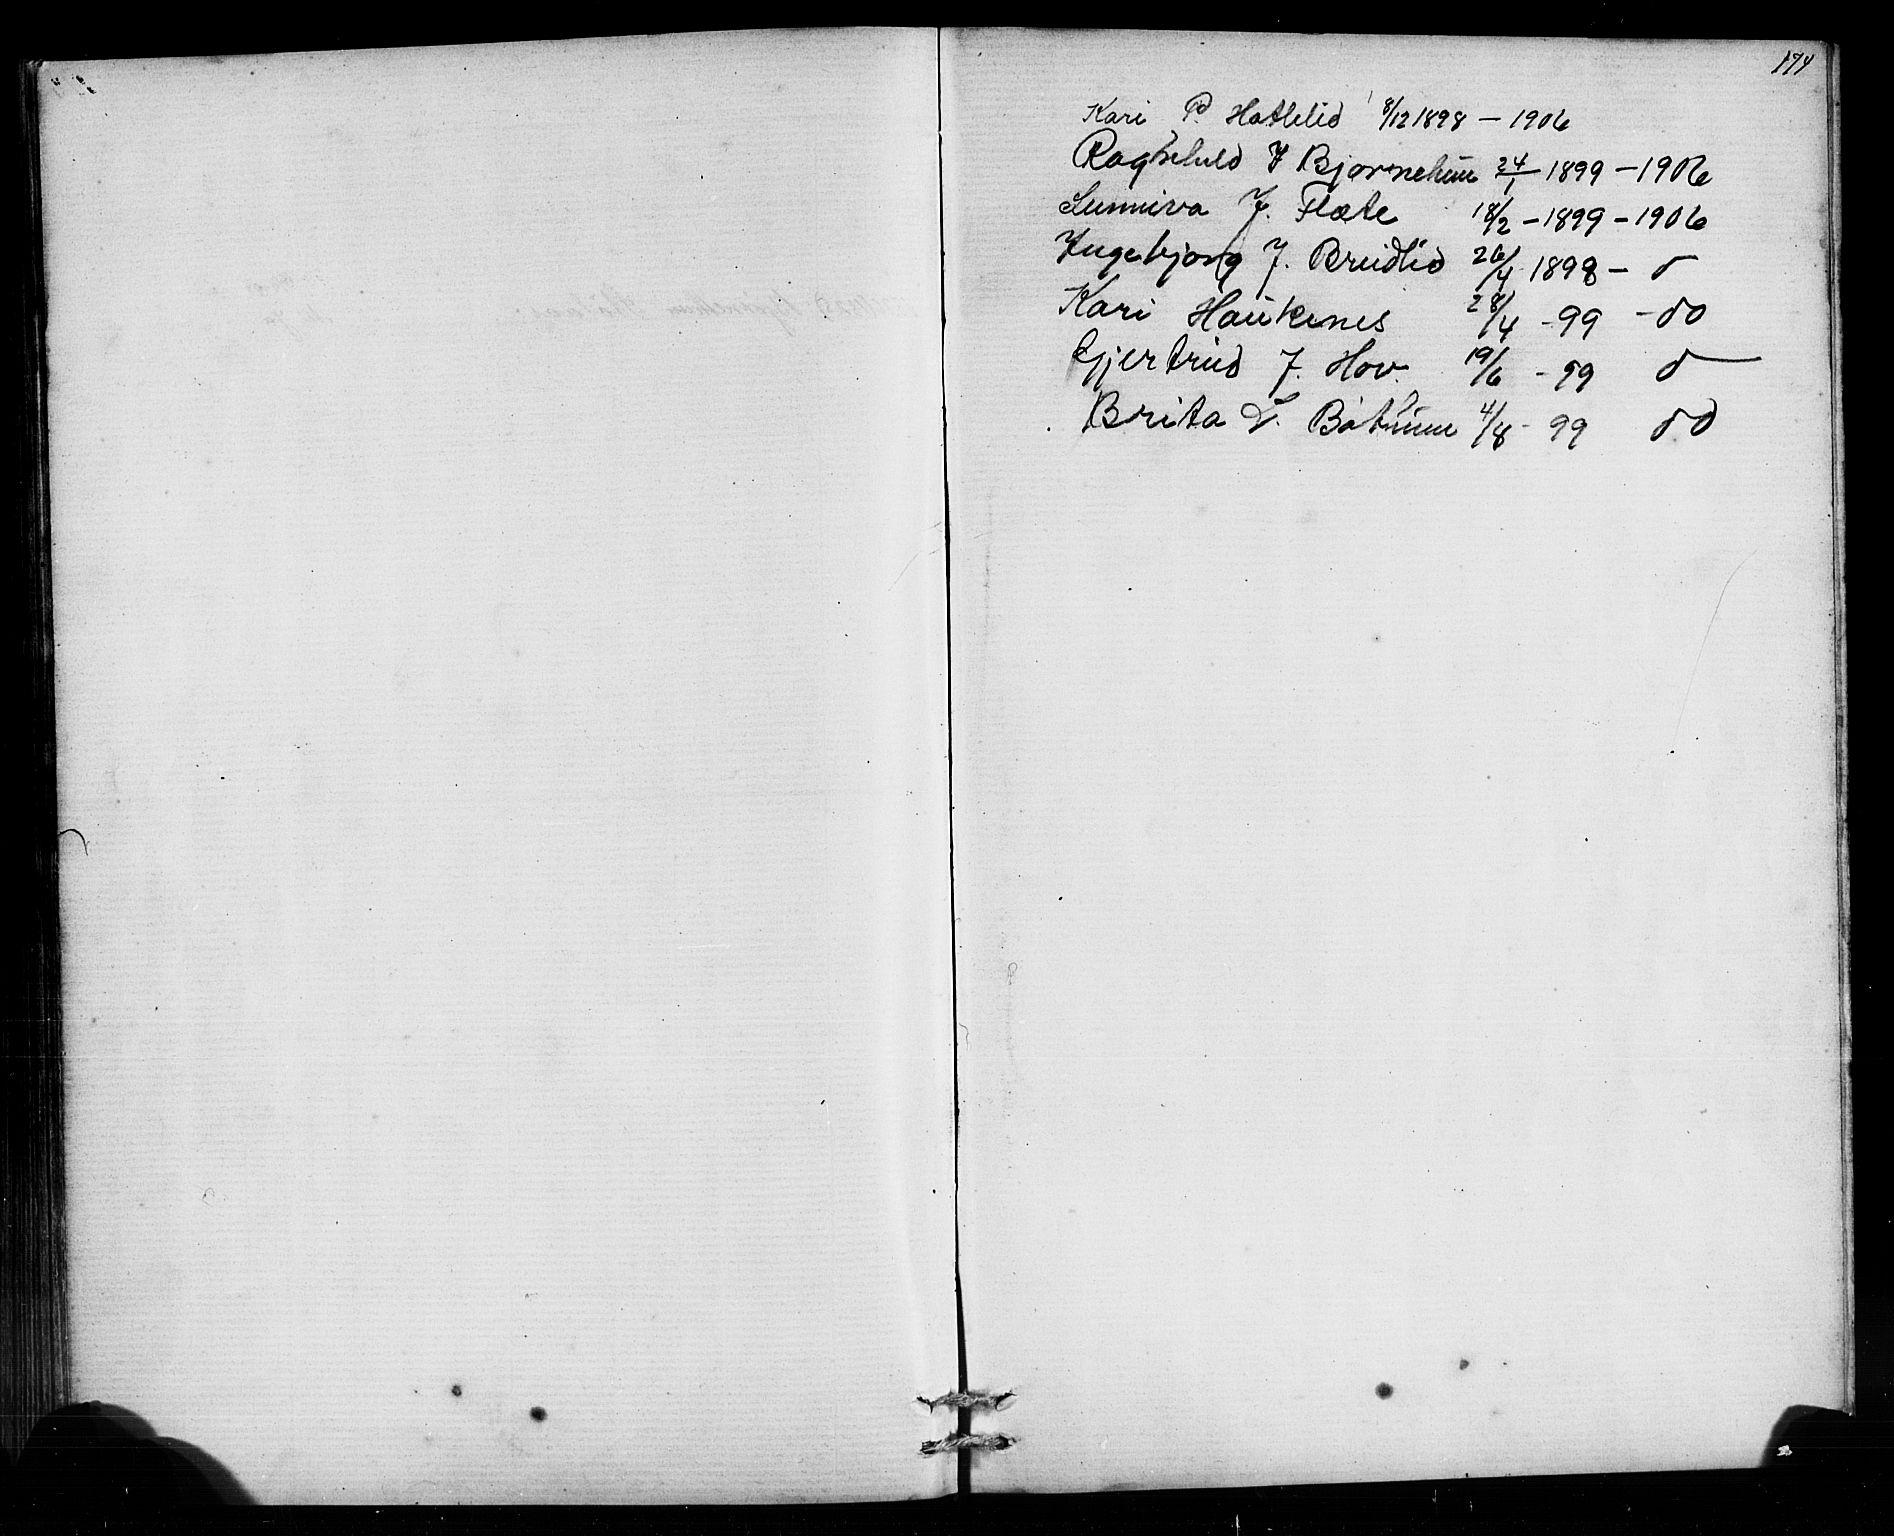 SAB, Leikanger Sokneprestembete, Klokkerbok nr. B 1, 1873-1908, s. 174